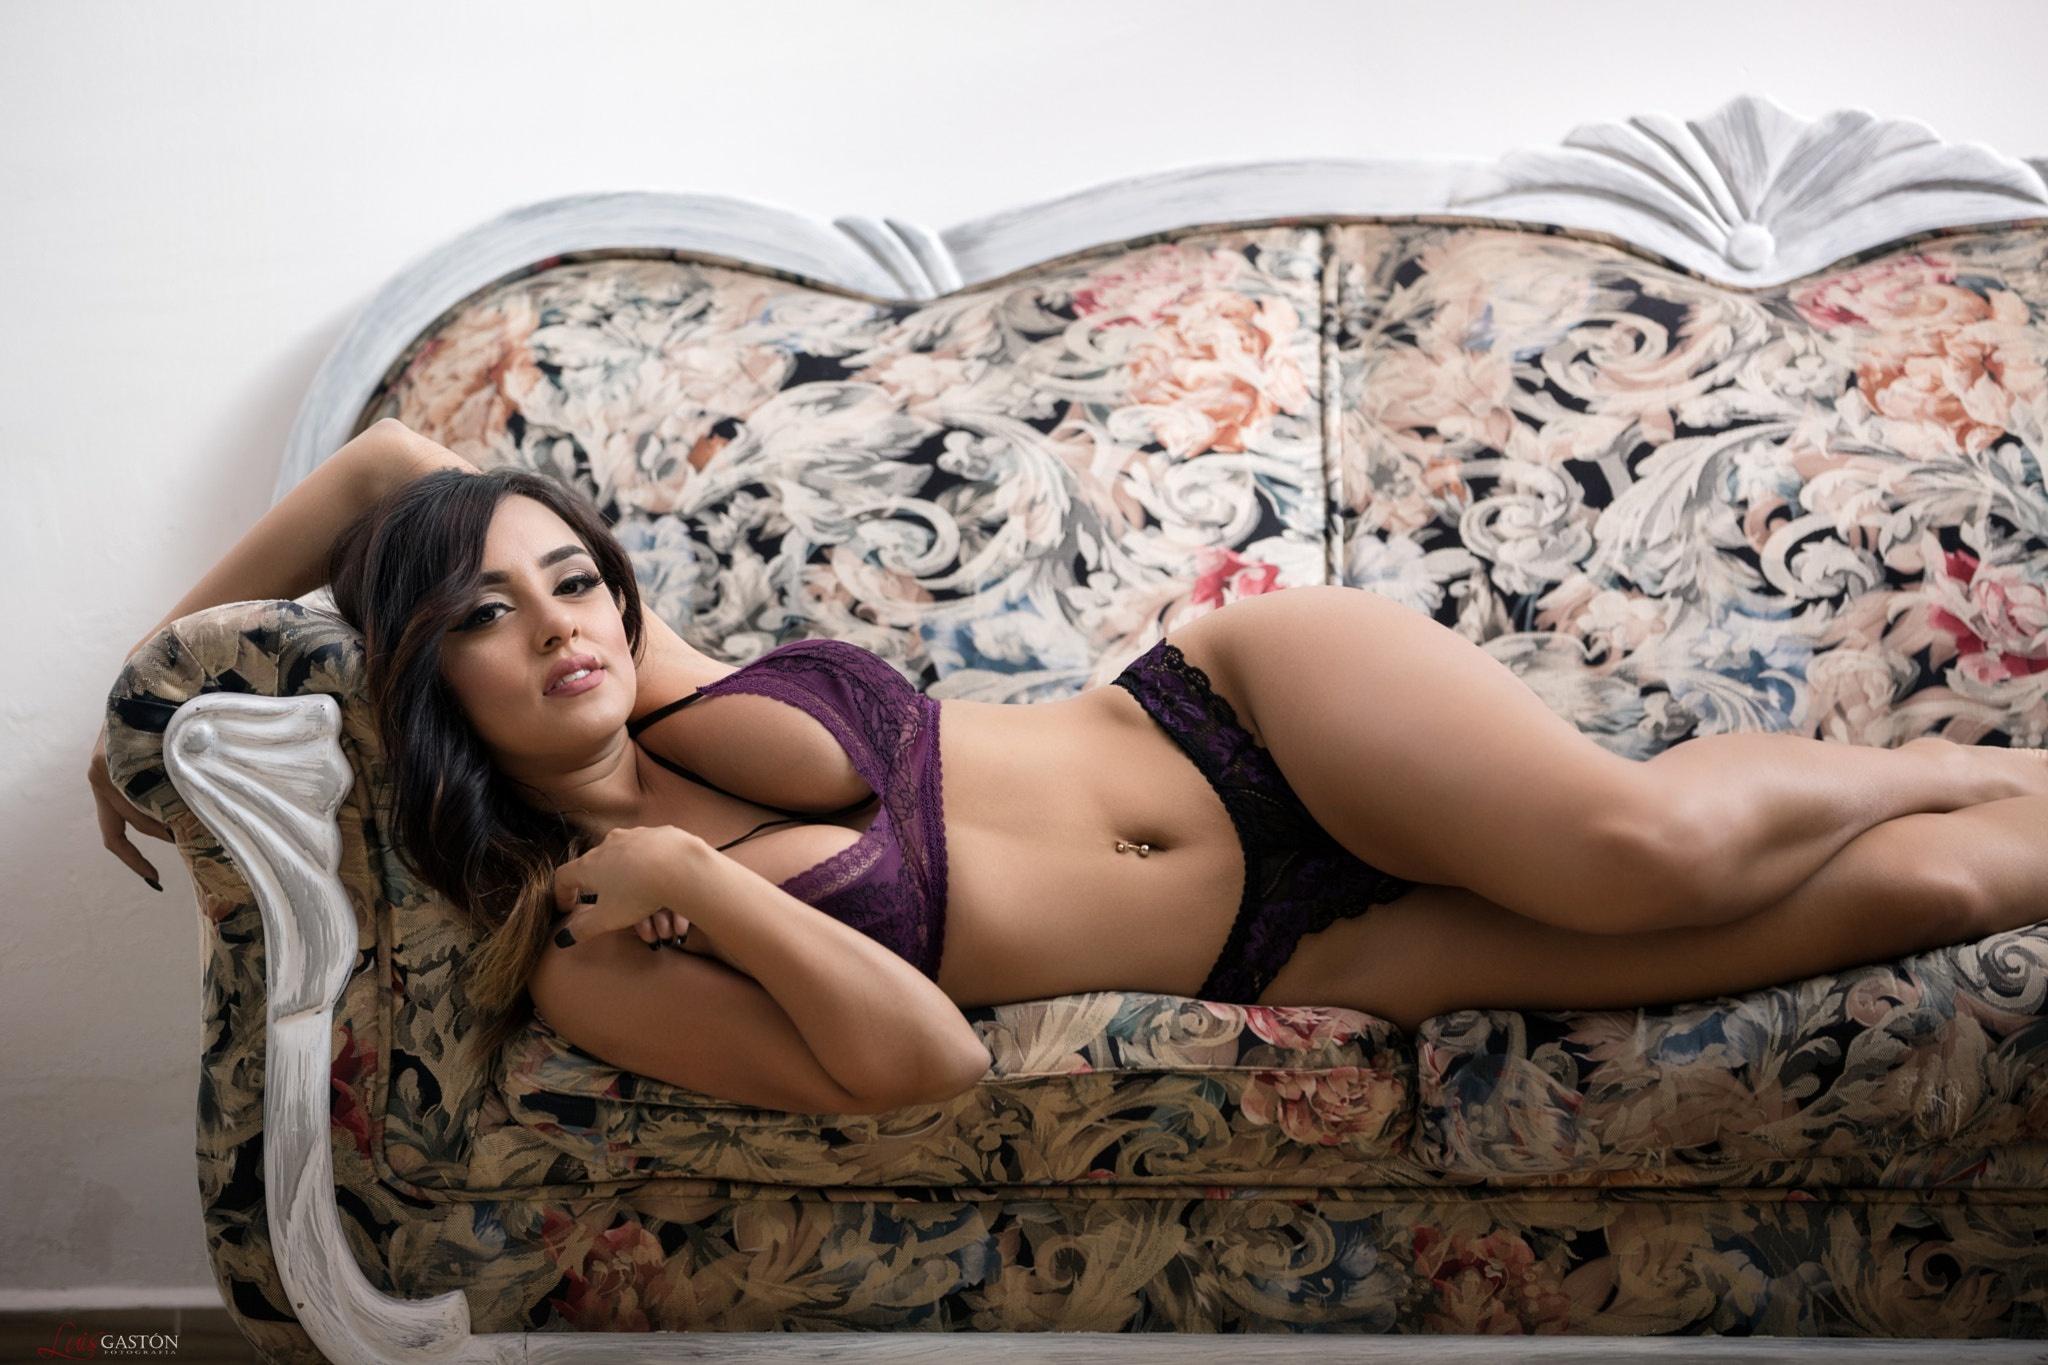 Image: Brunette, Luis Gaston, model, lies, sofa, shapes, breast, legs, look, pose, lingerie, piercing